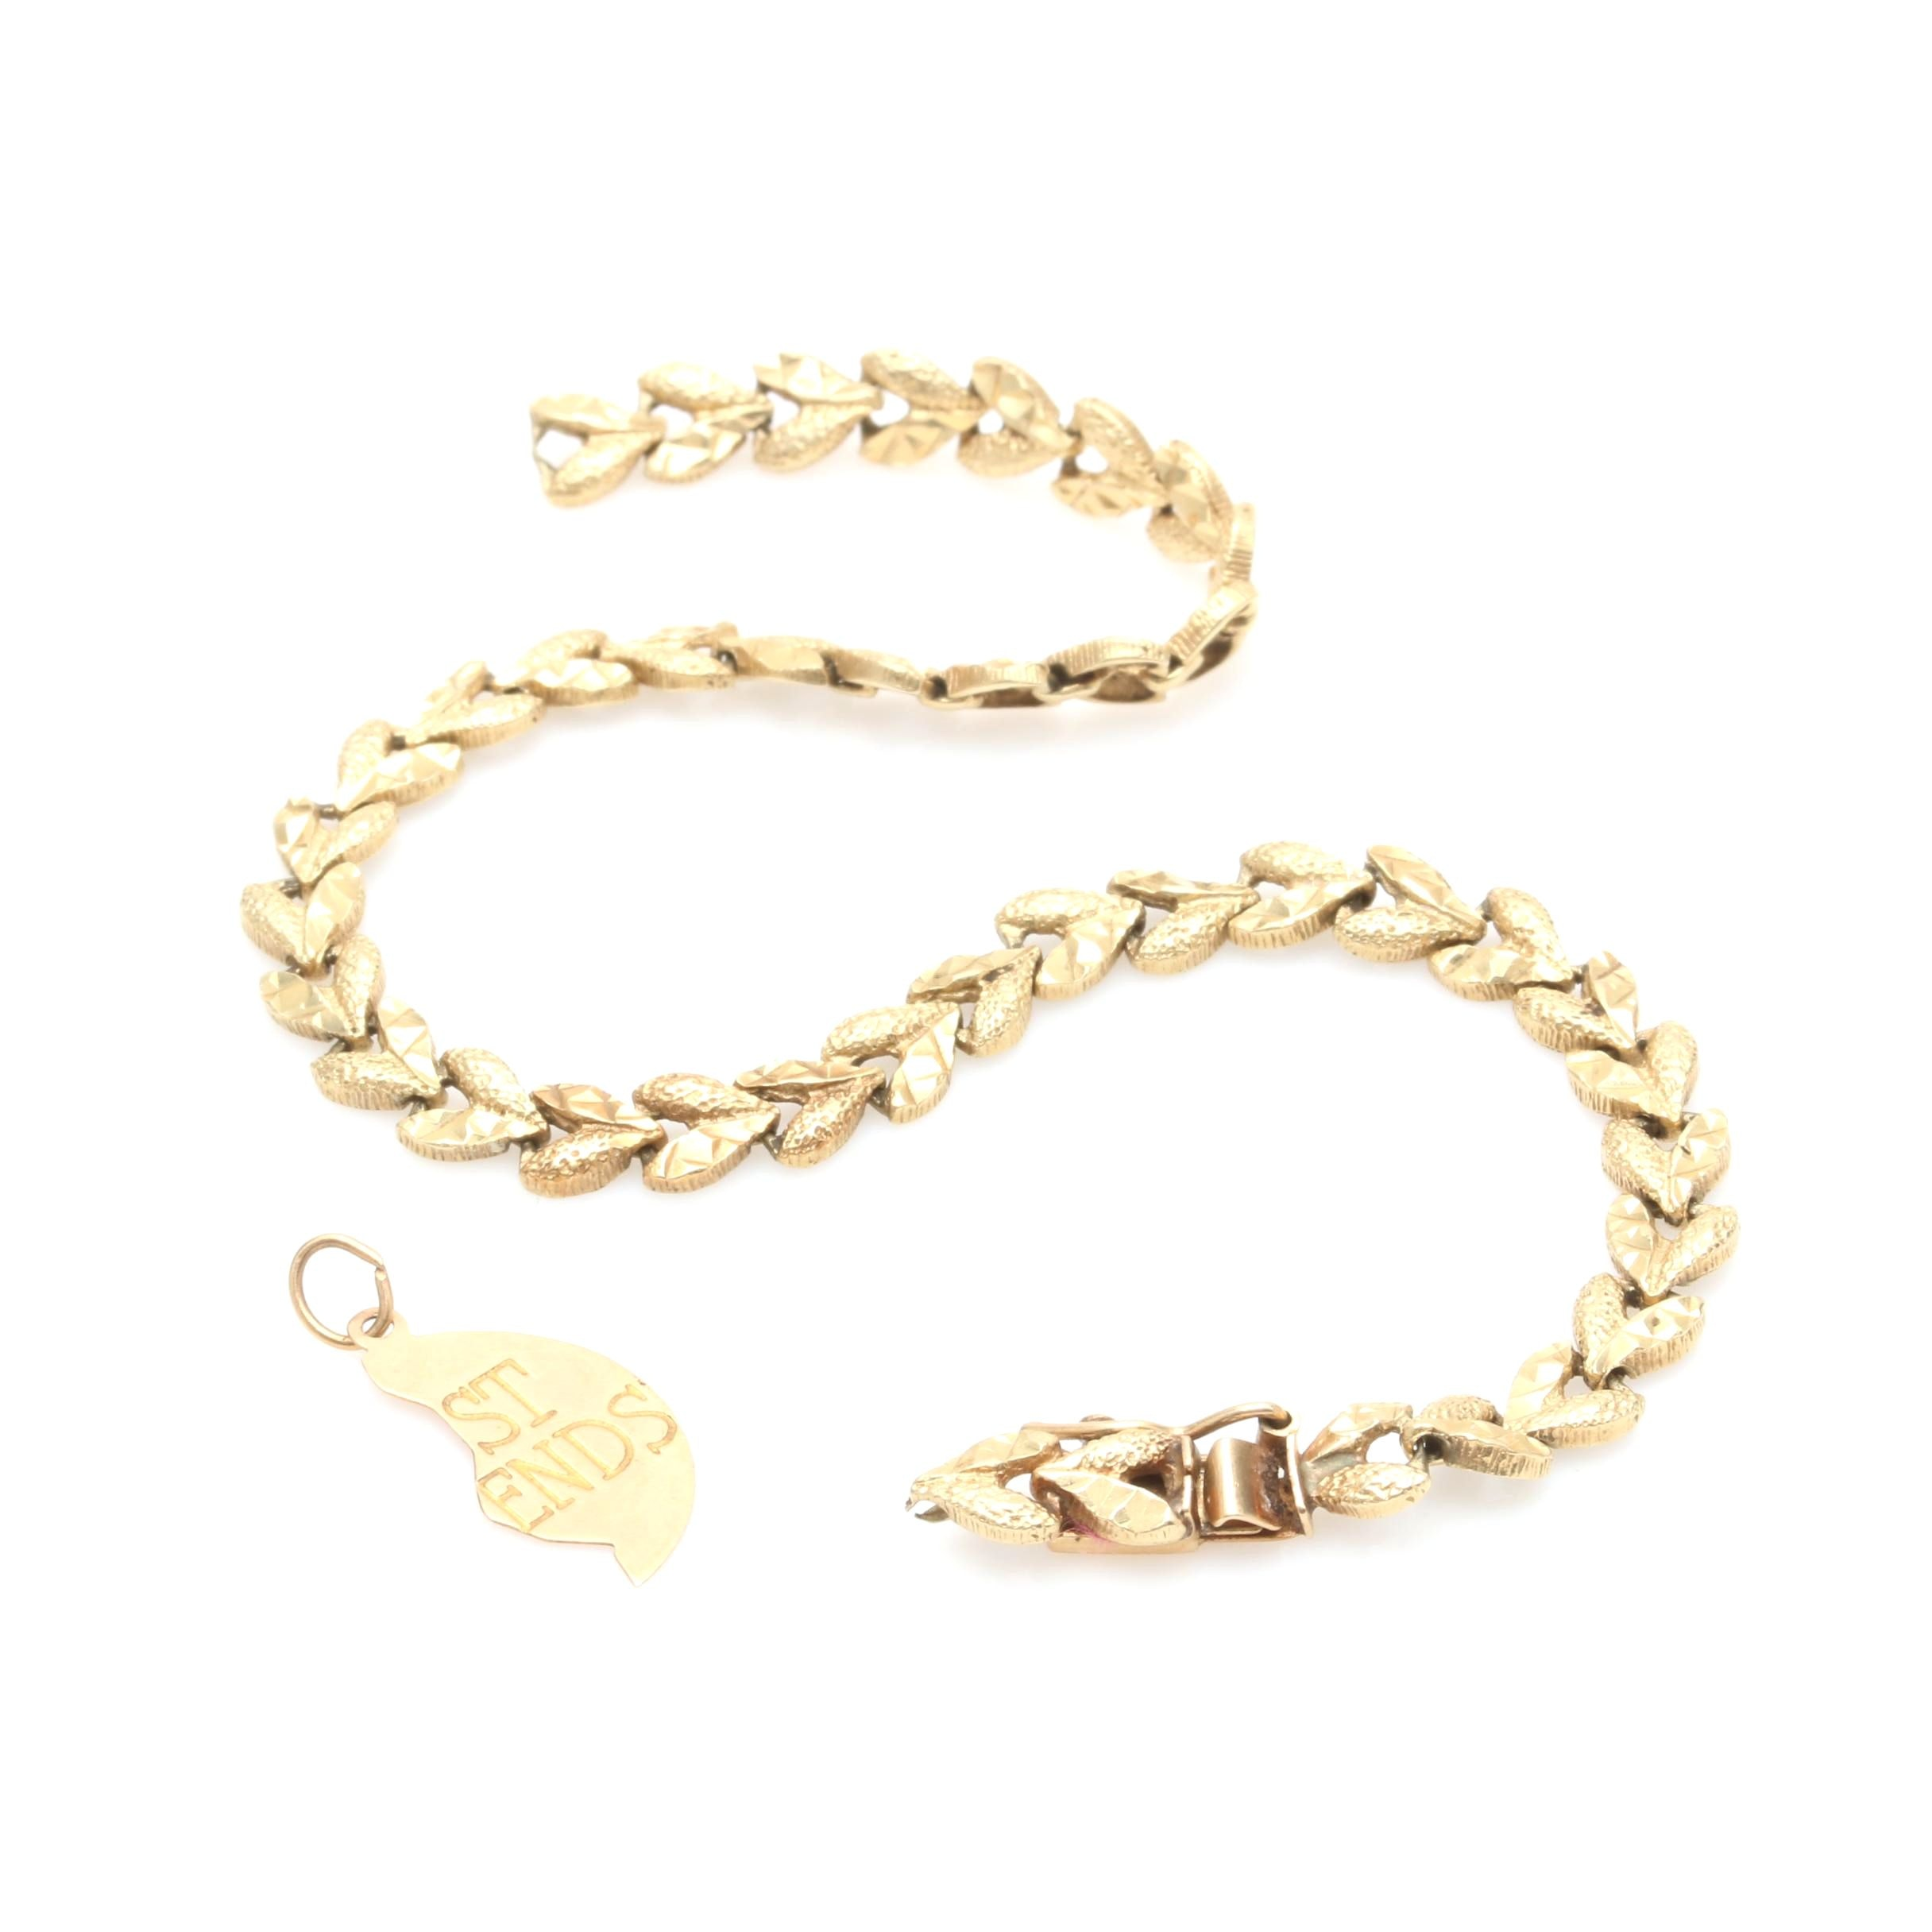 14K Scrap Gold Bracelet and Charm